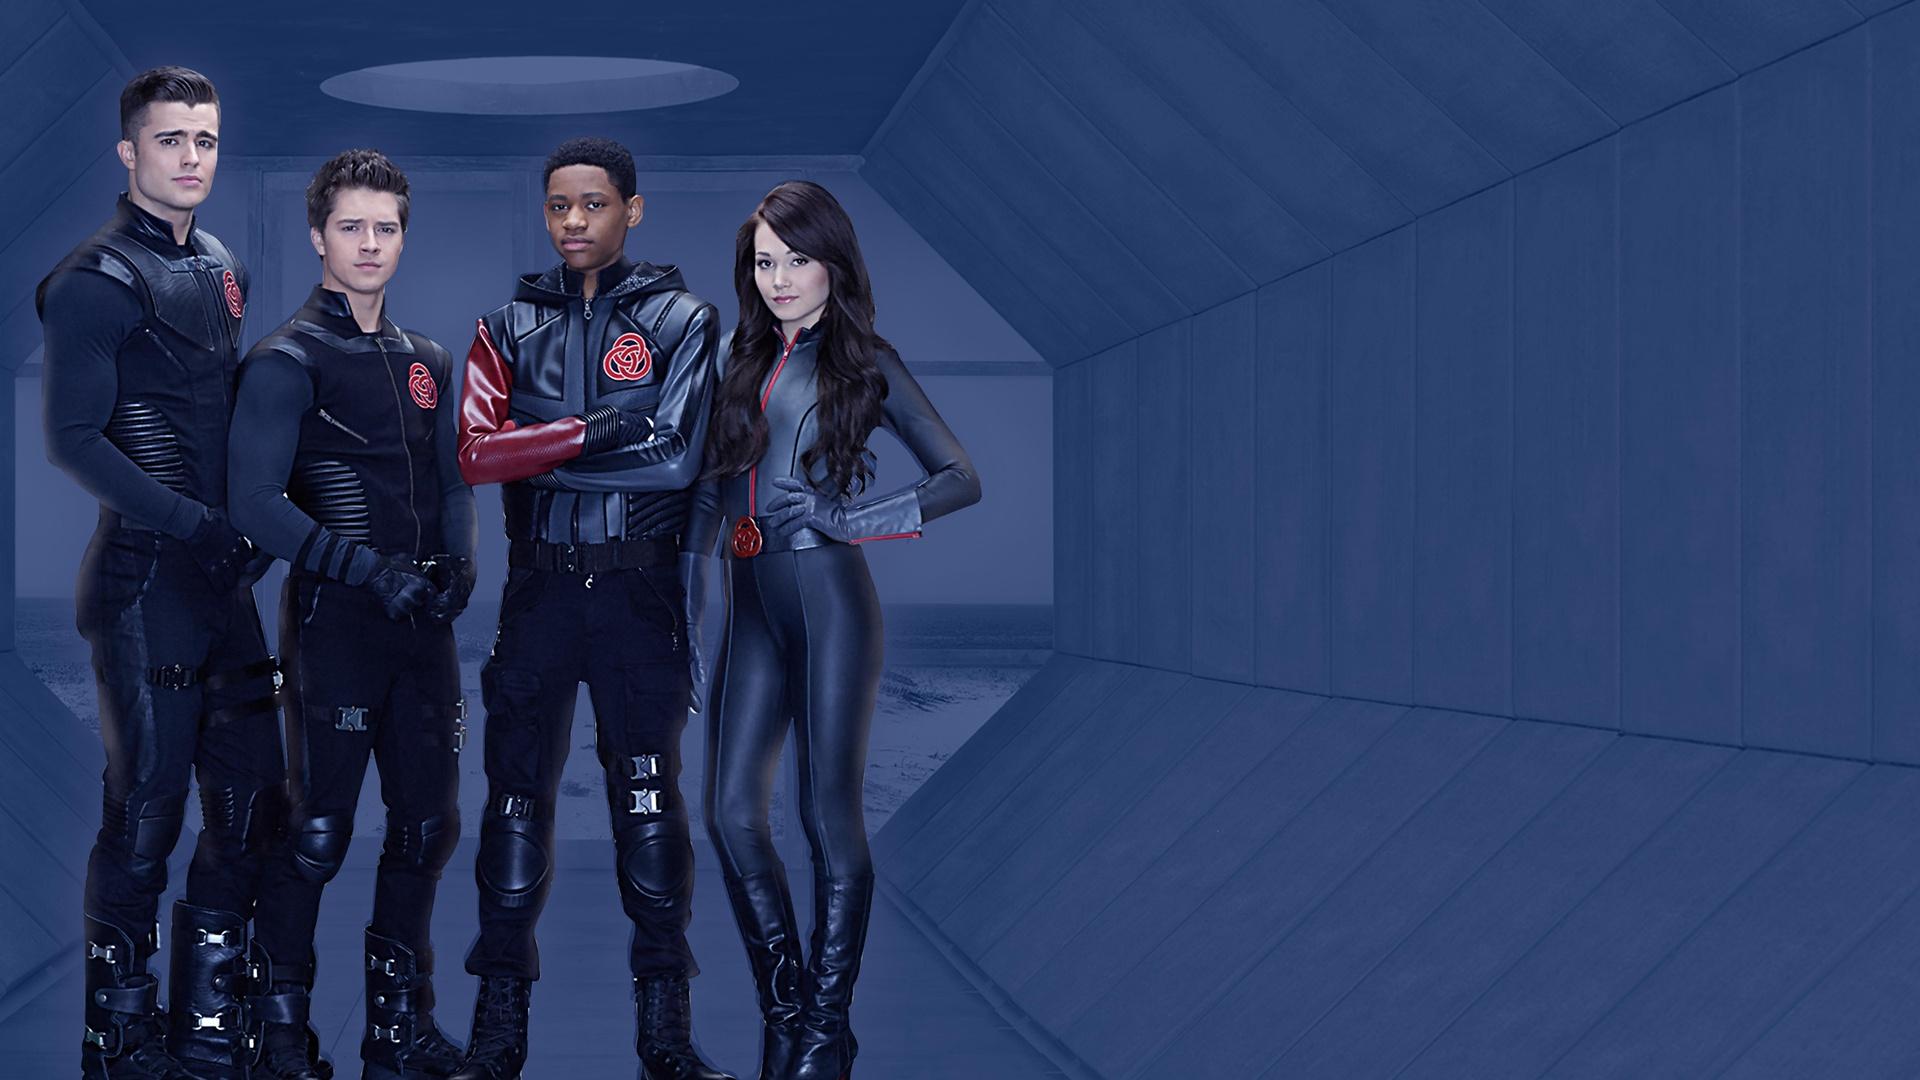 Watch Lab Rats TV Show | Disney XD on DisneyNOW